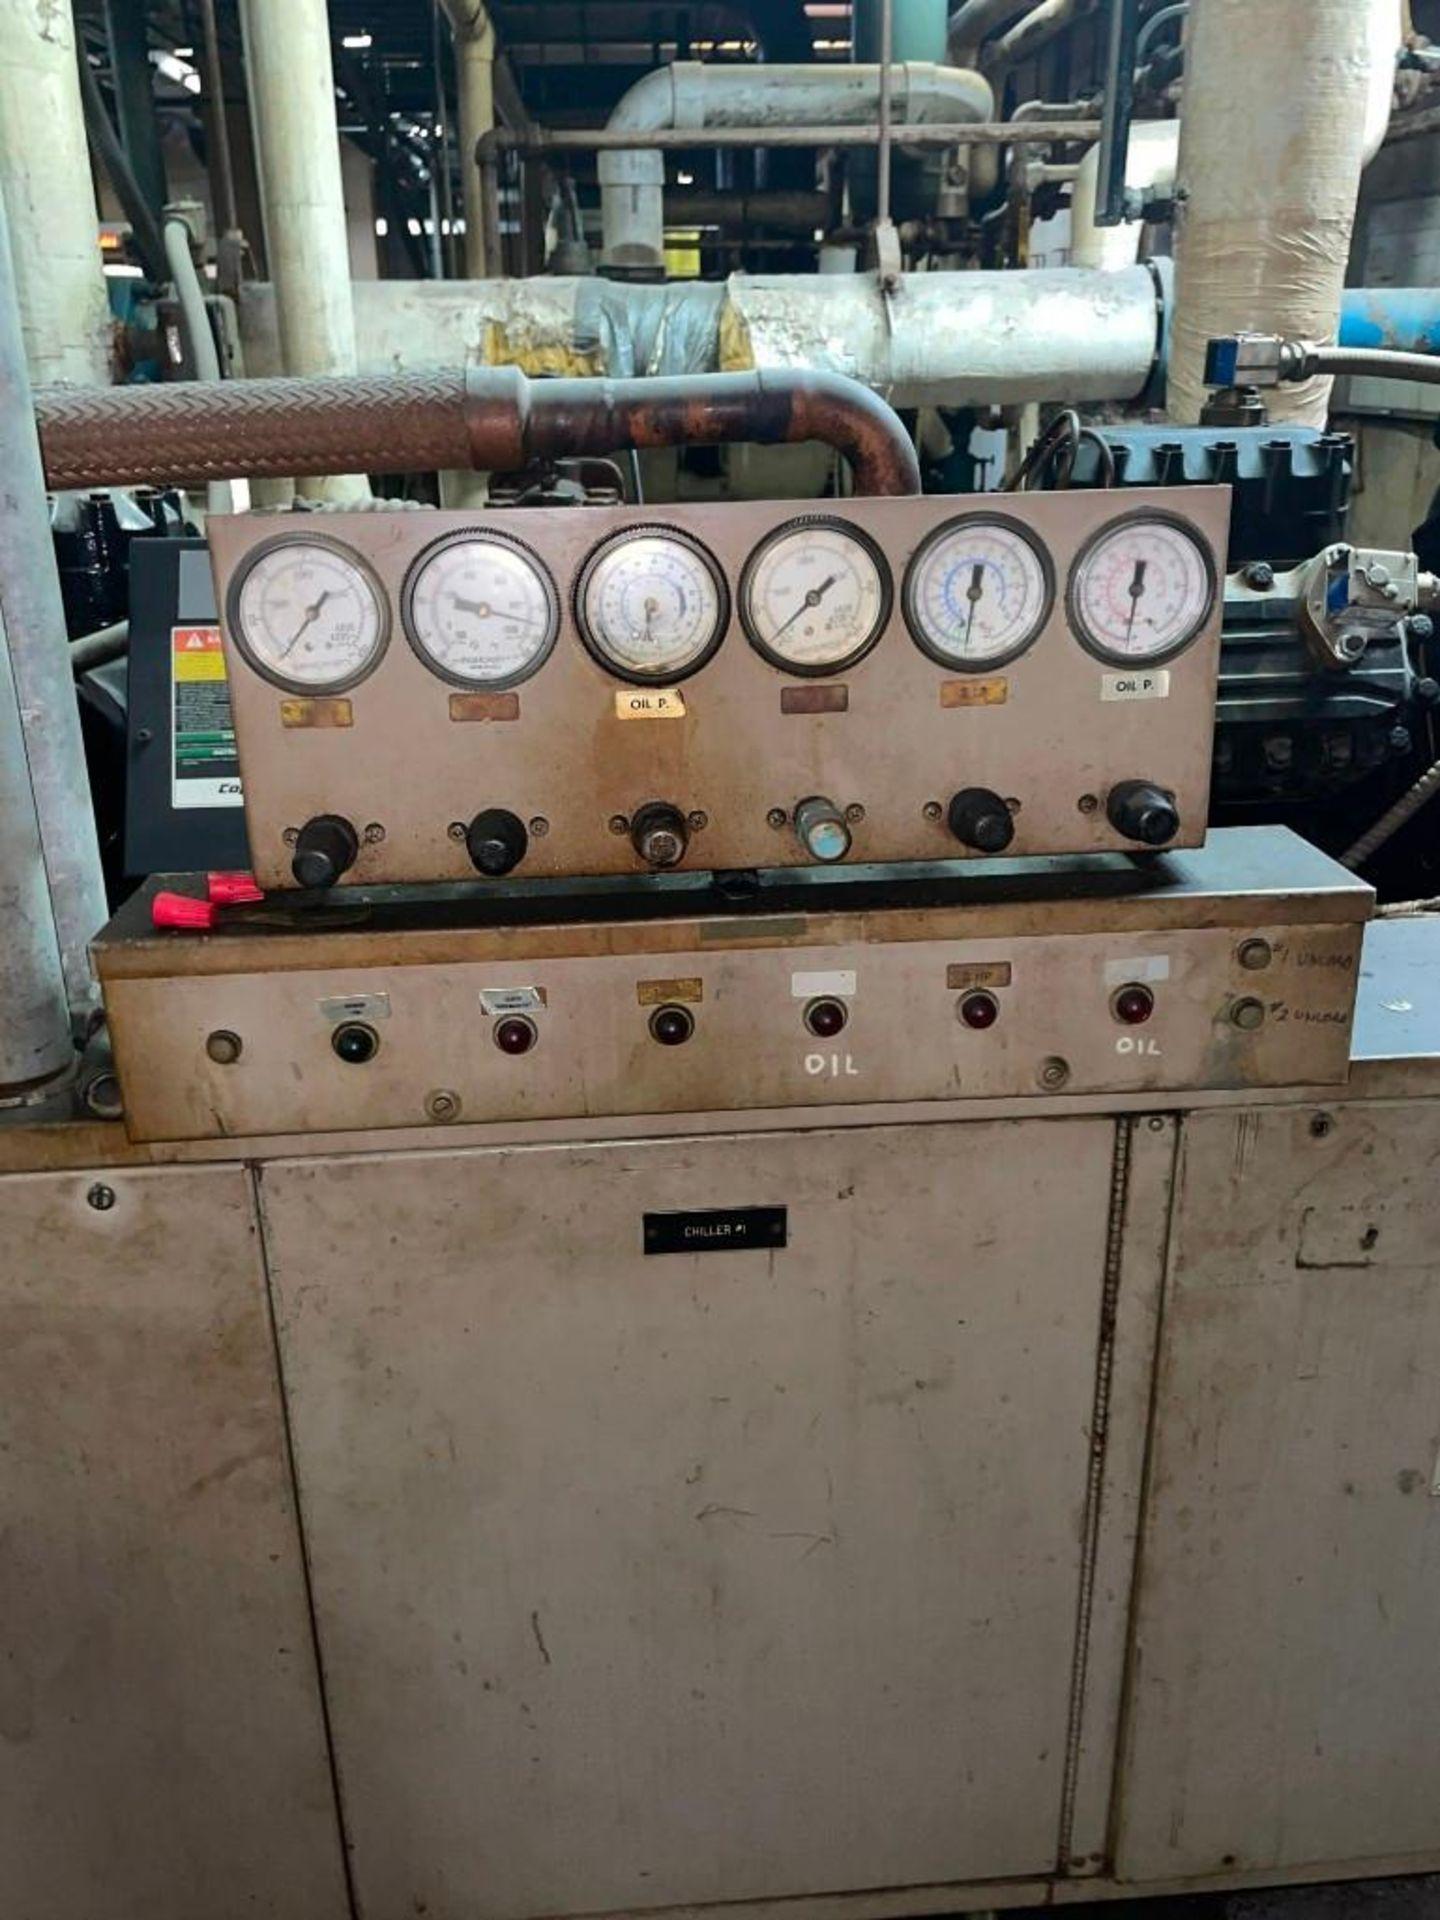 Copeland Copelametic Compressor for Chiller System - Image 9 of 12